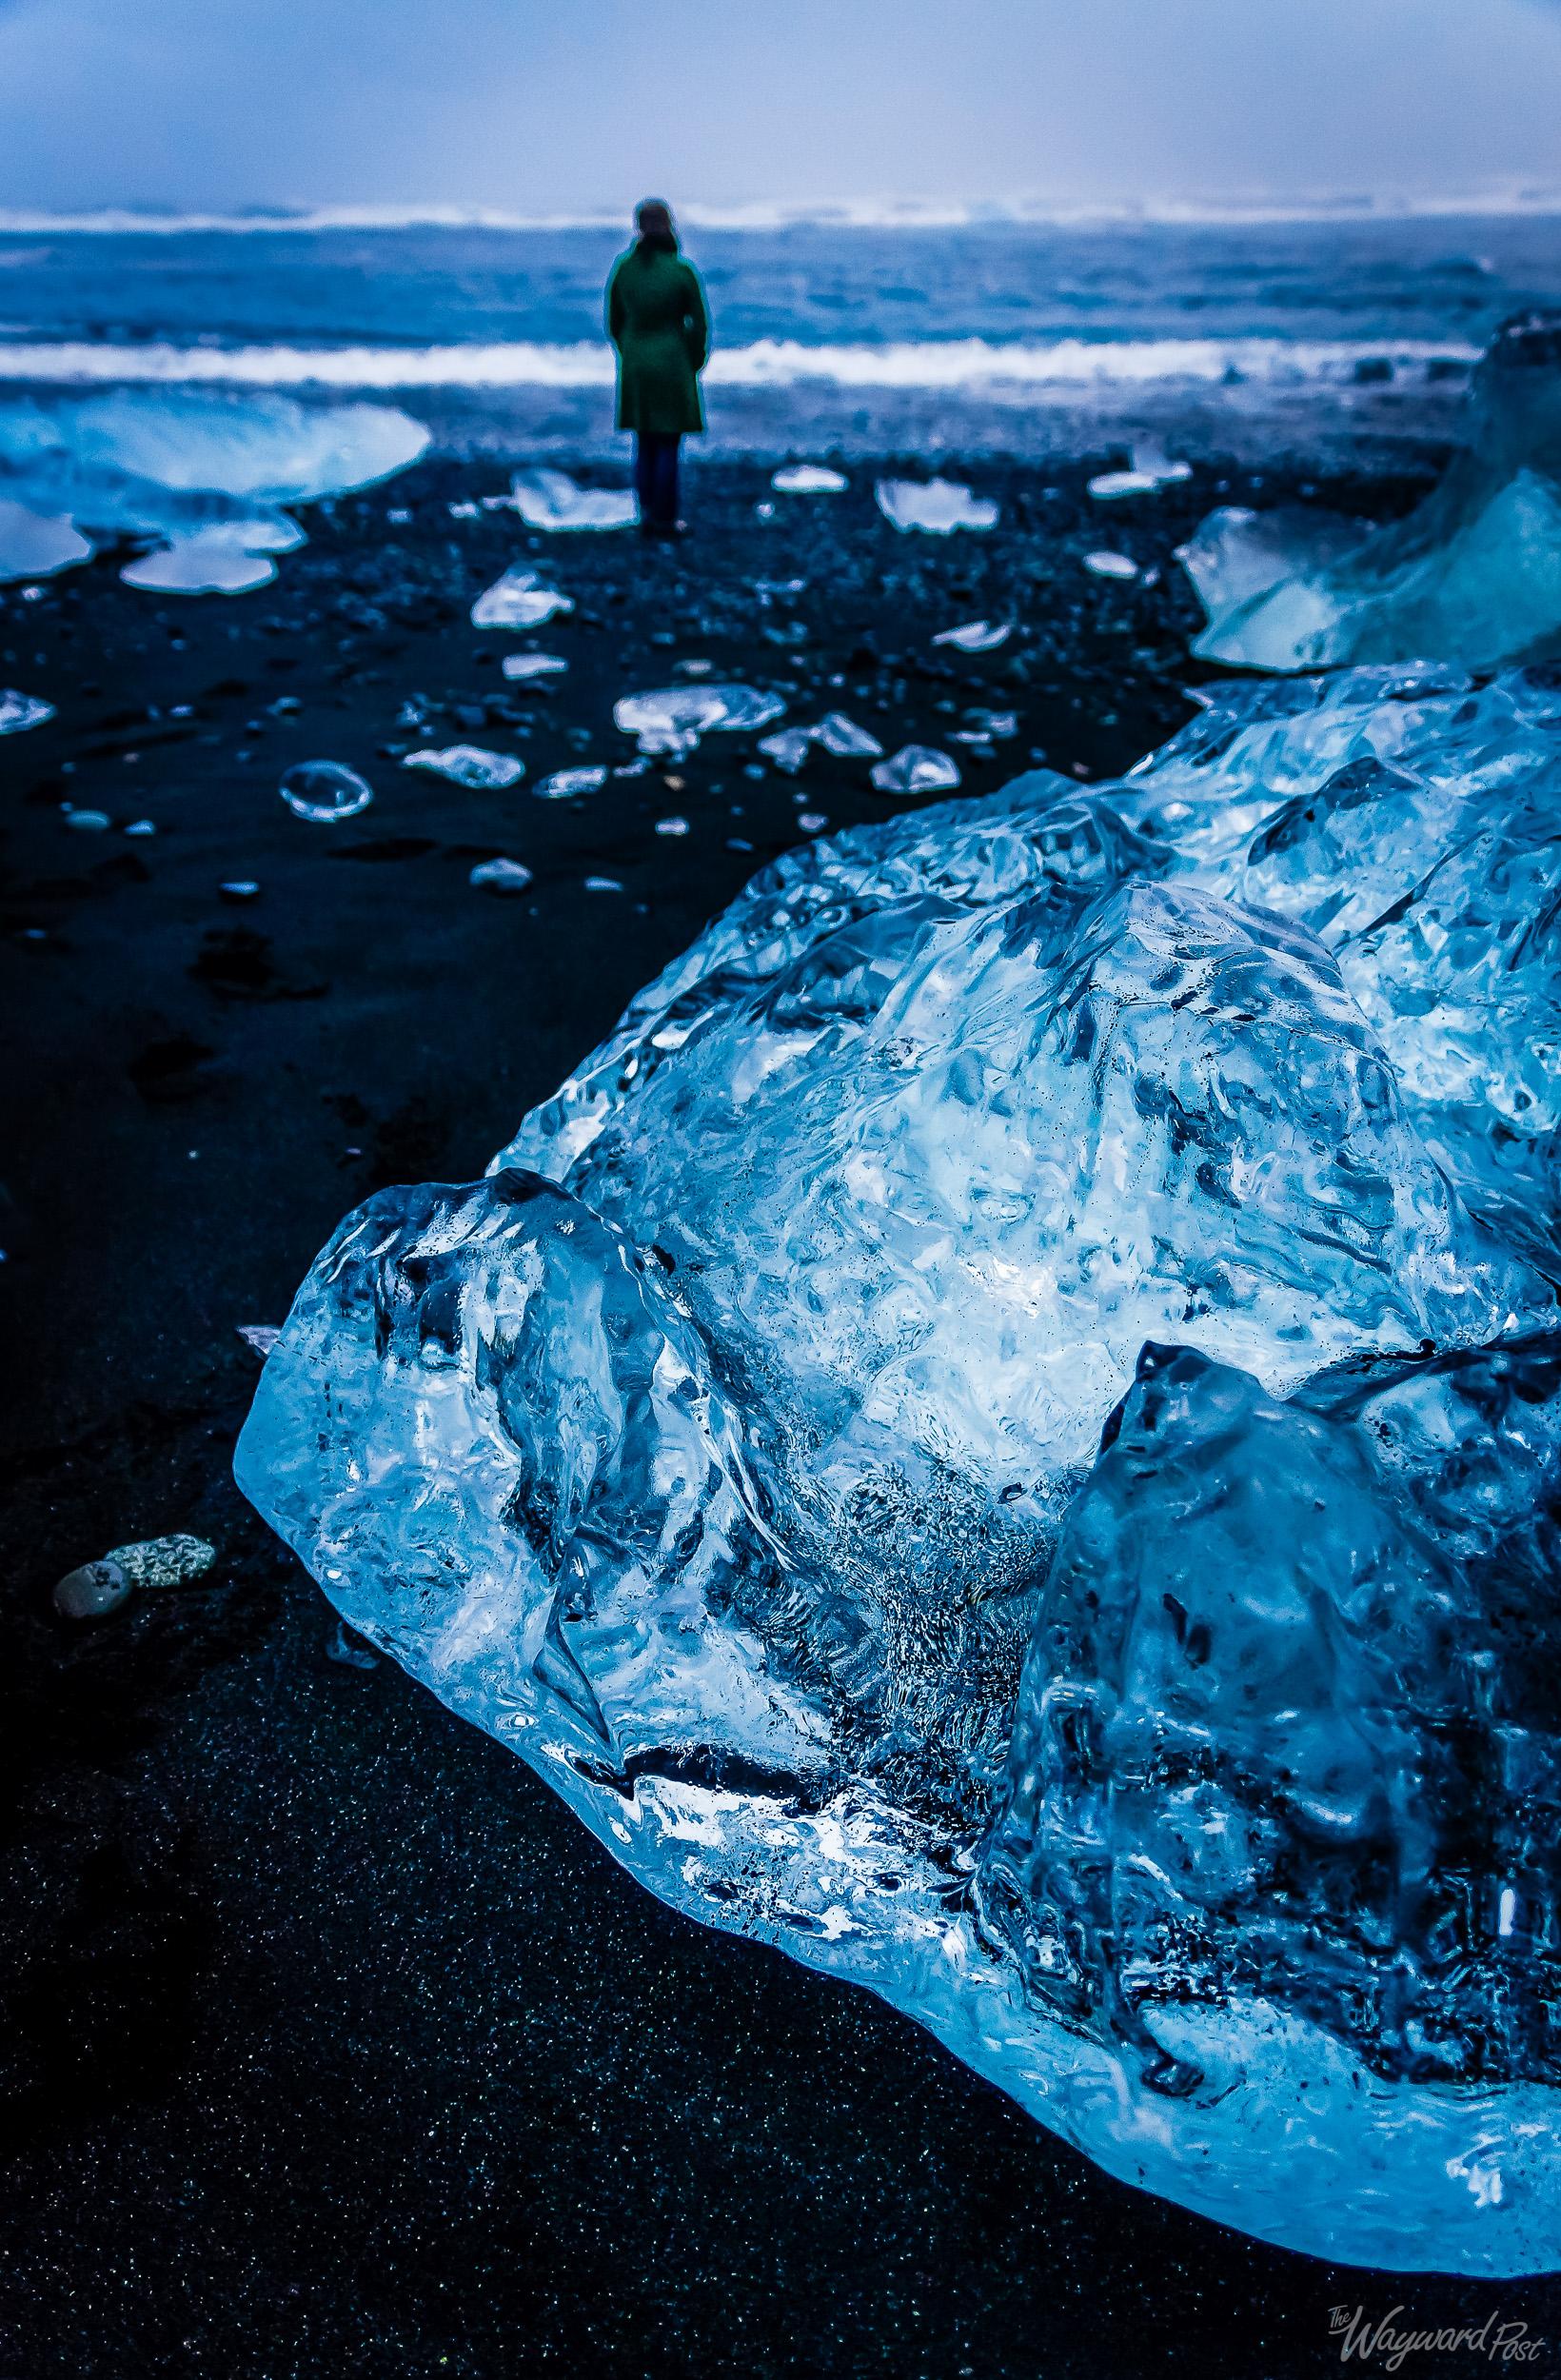 Iceberg, Glacier, Ice, Lake, Sea, Ocean, Woman, Iceland, The Wayward Post